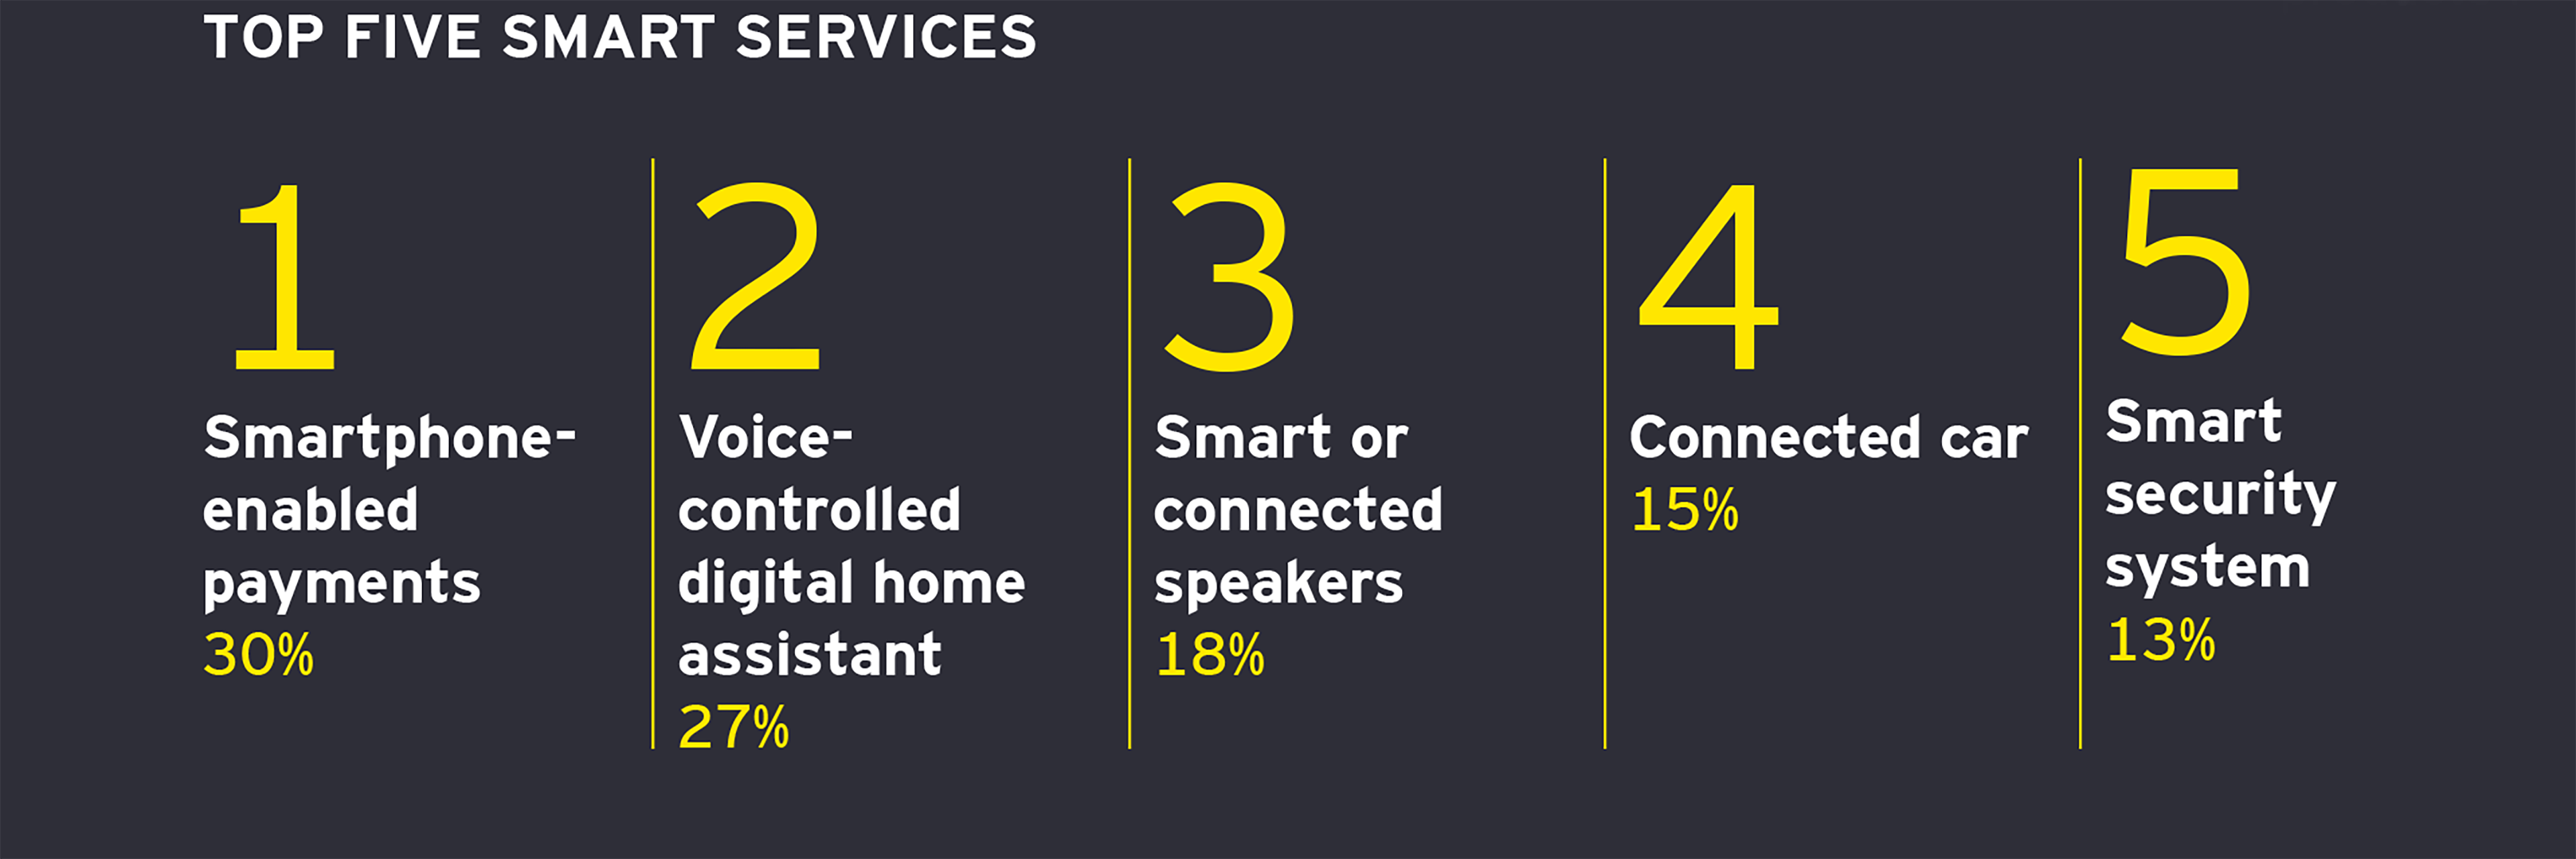 top 5 smart services